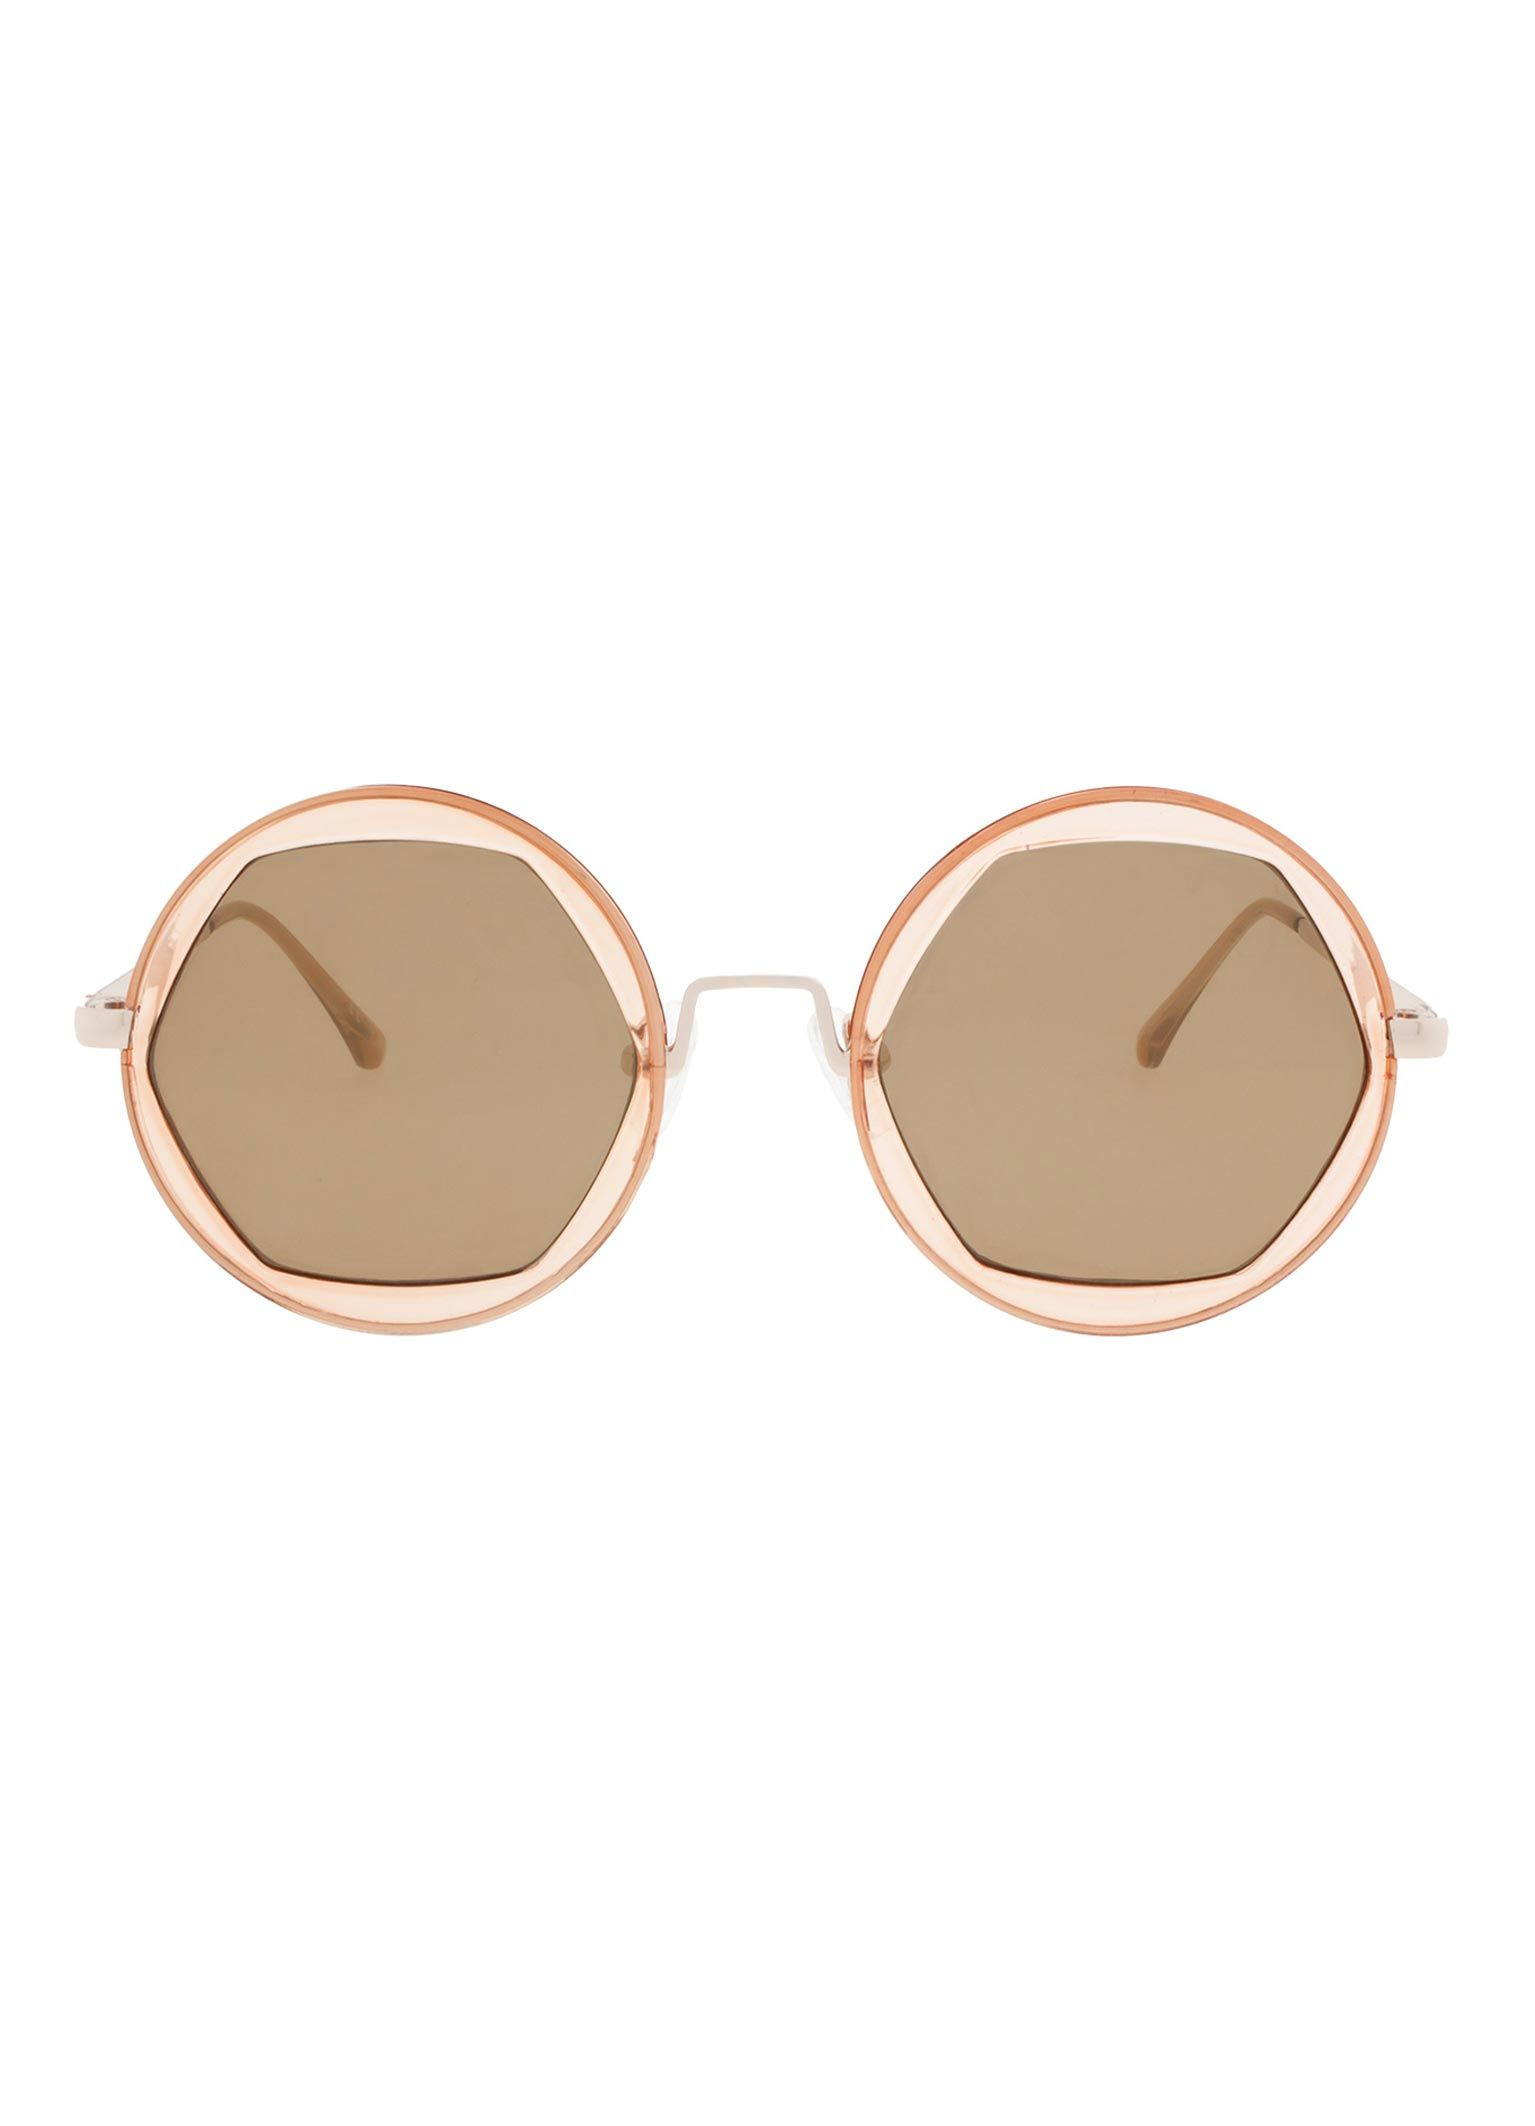 Afbeelding van Icon Eyewear Zonnebril Zari Clear Peach (As C2) 17M7032